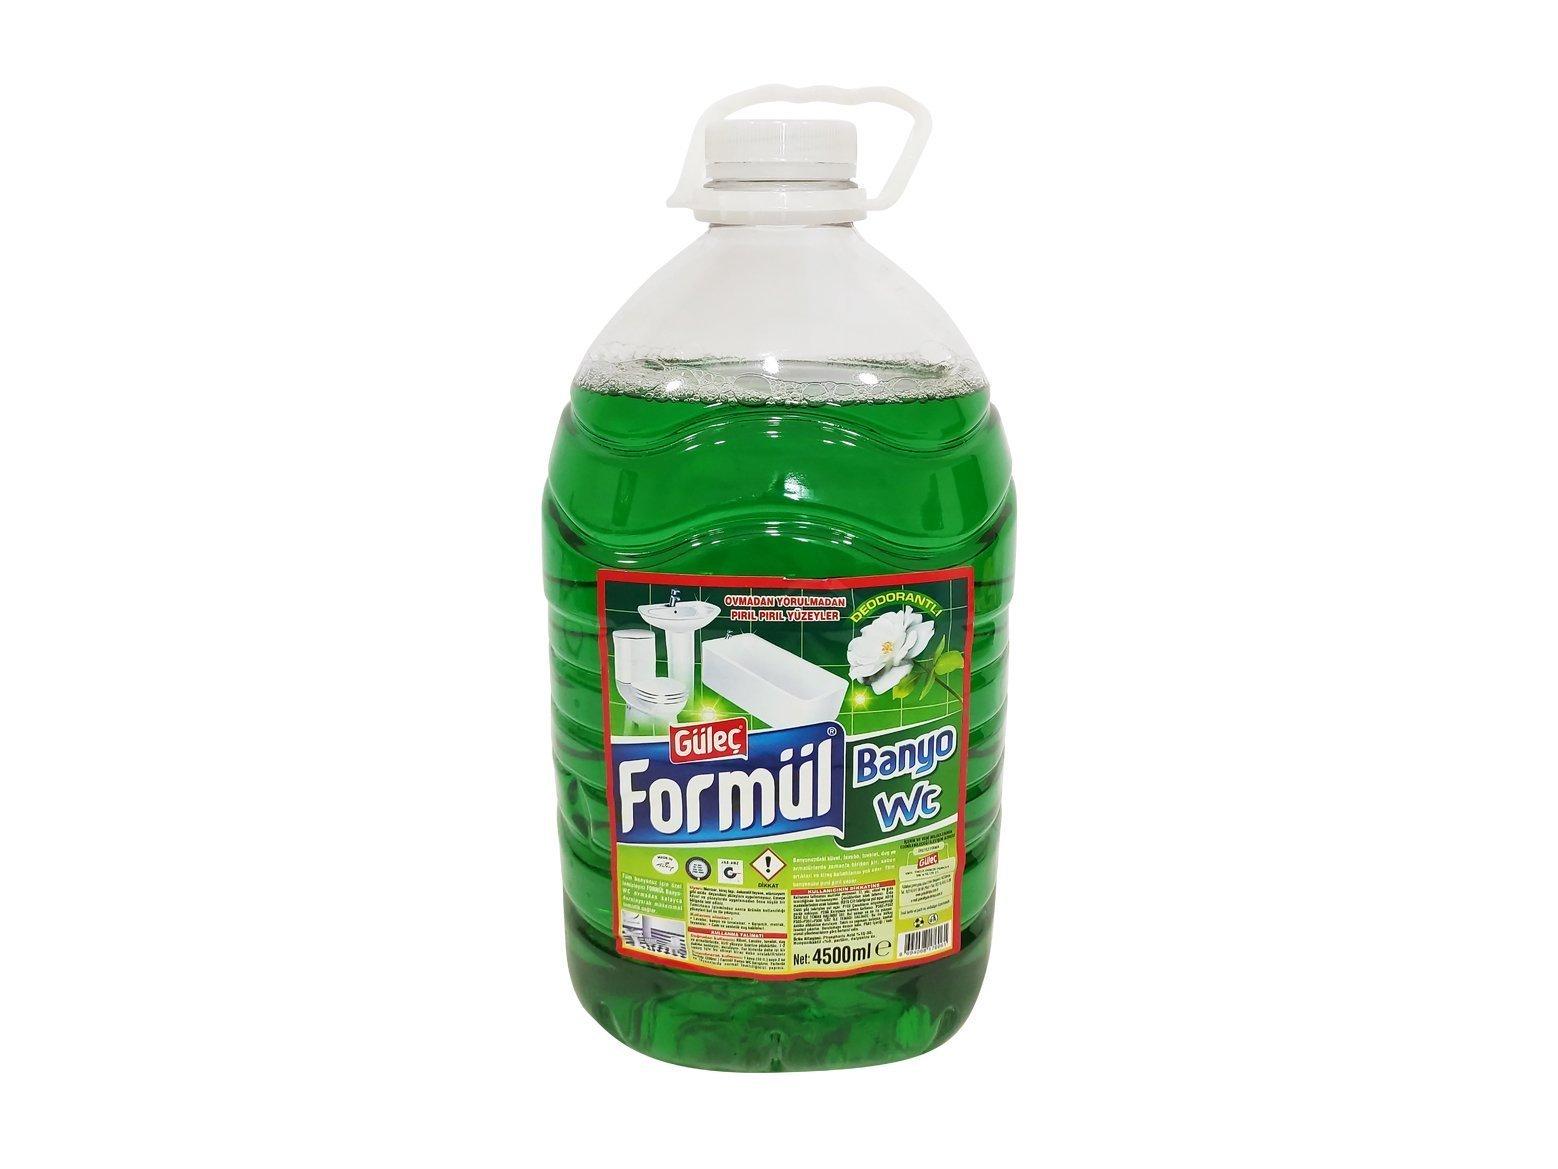 Formül Banyo-Wc Parlatıcı 5000 ml